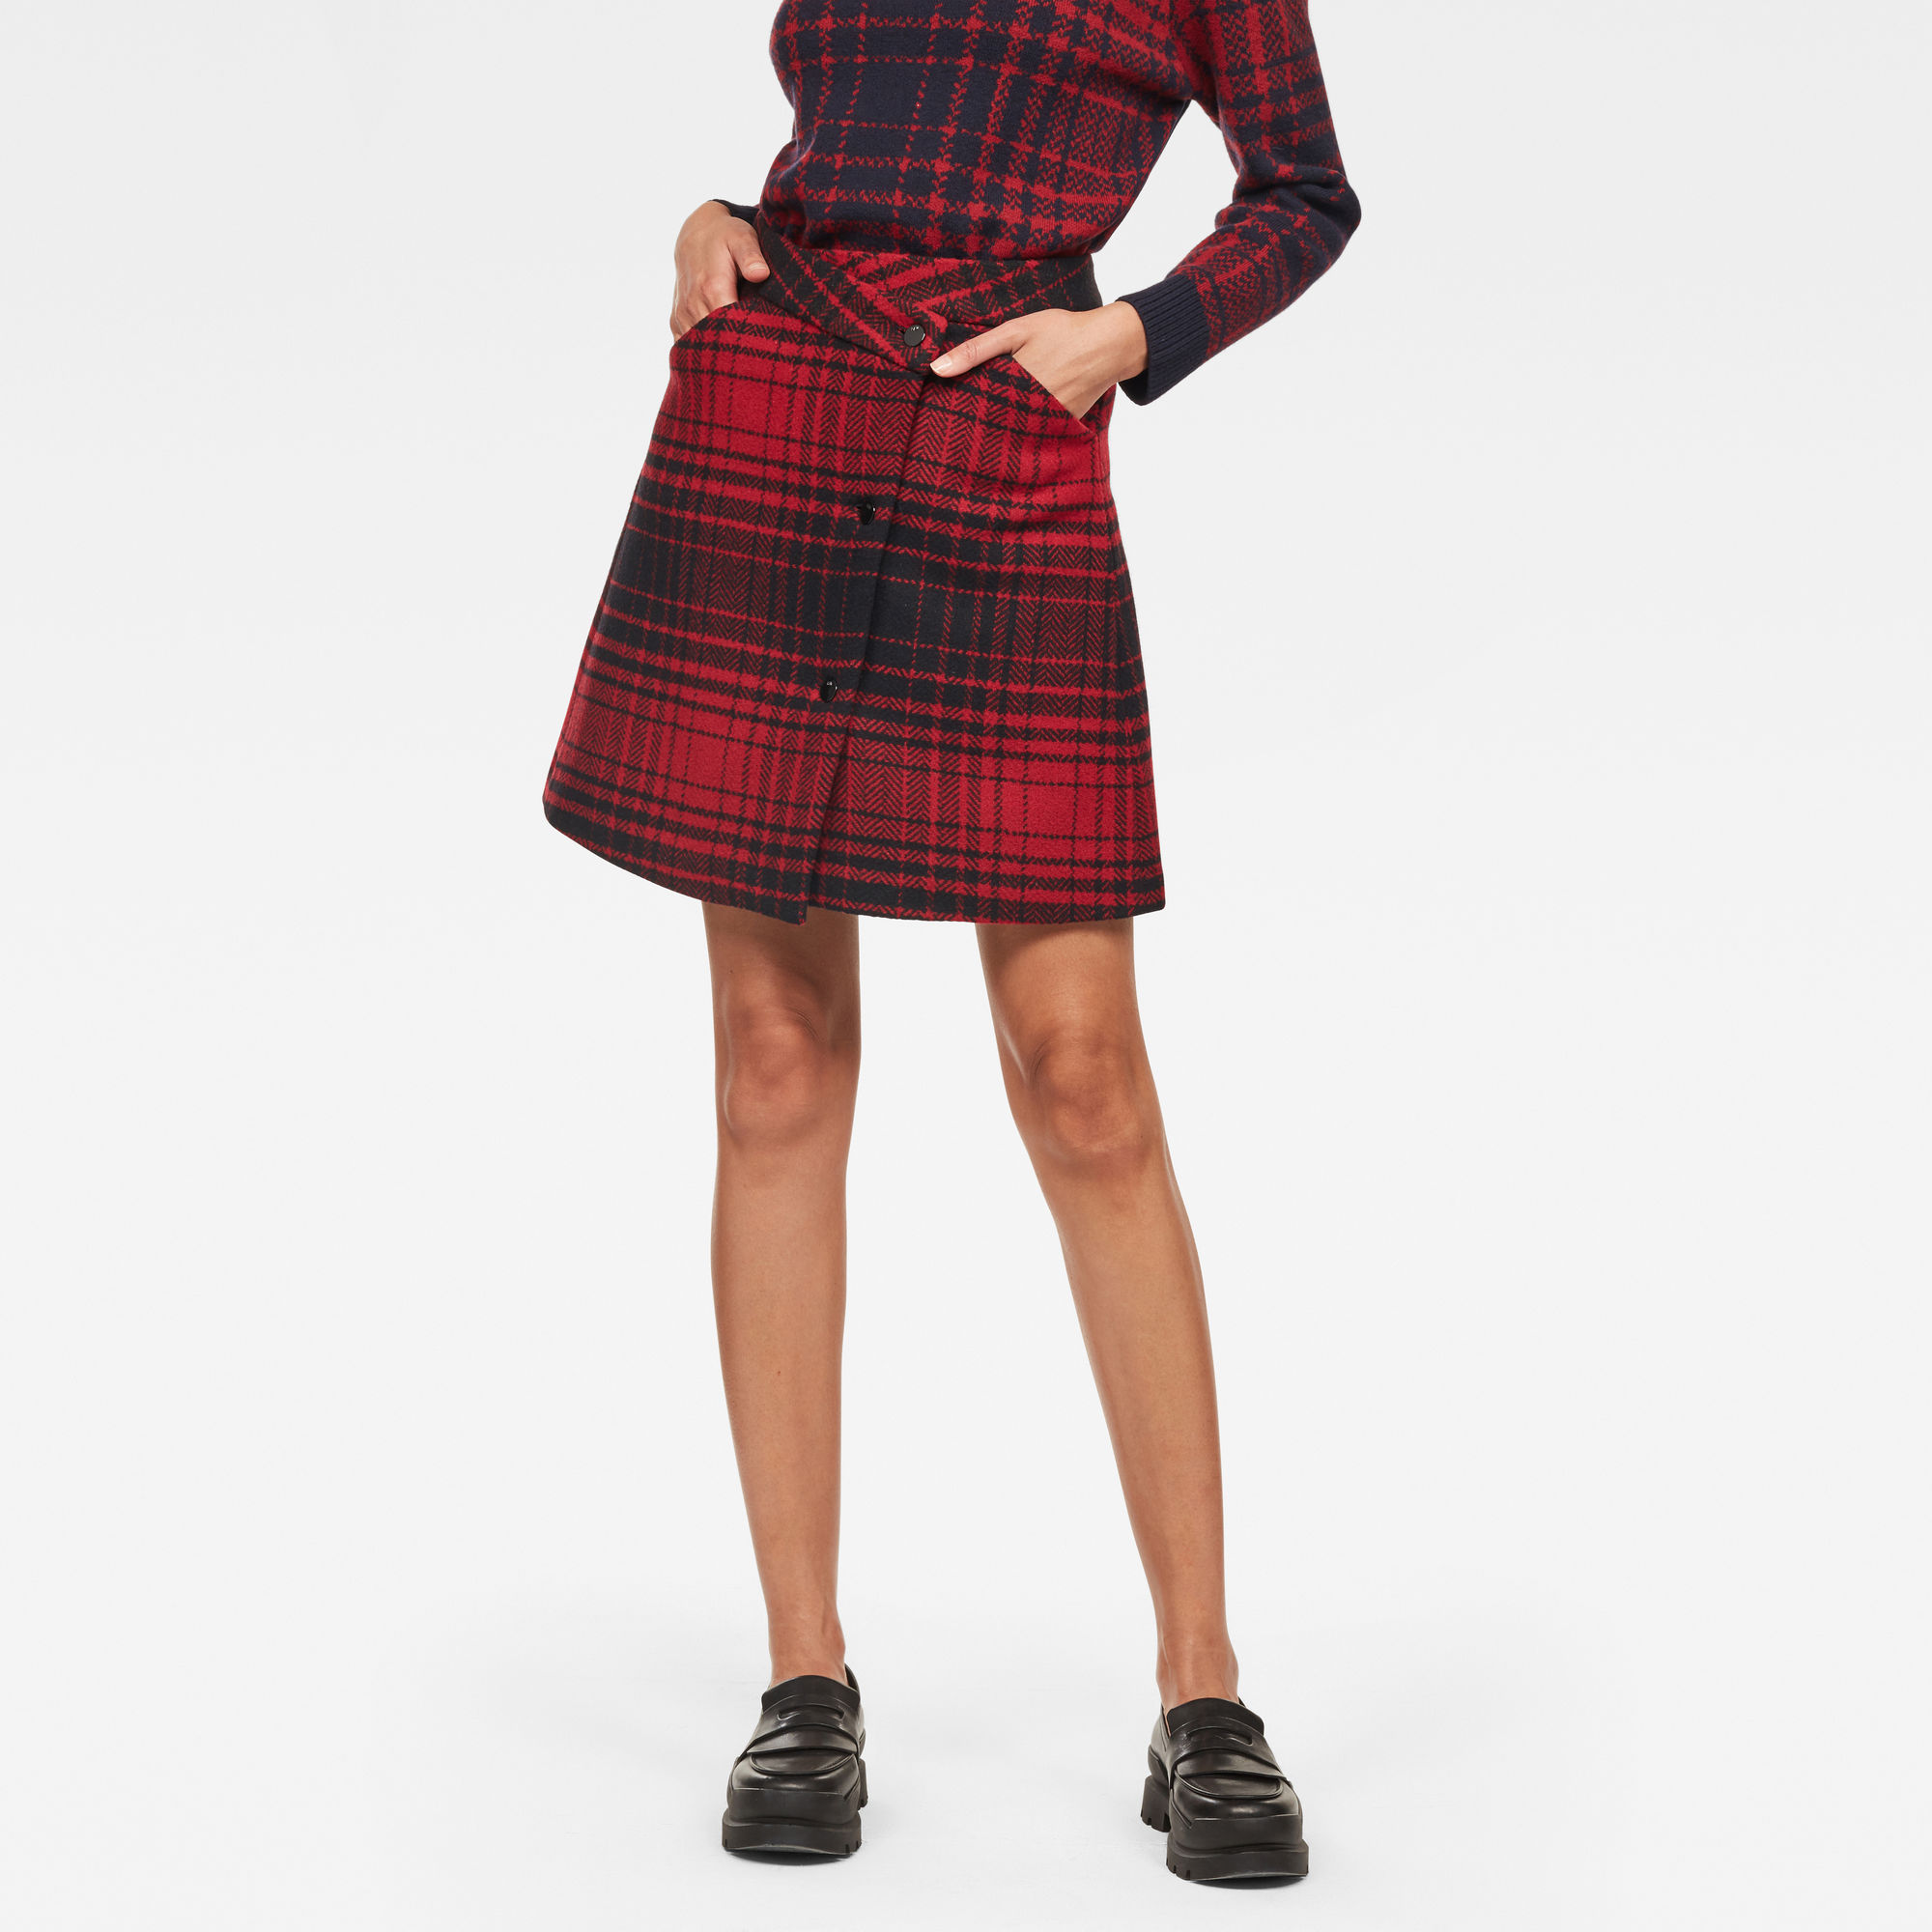 Image of G Star Raw 5621 Check Wrap Skirt